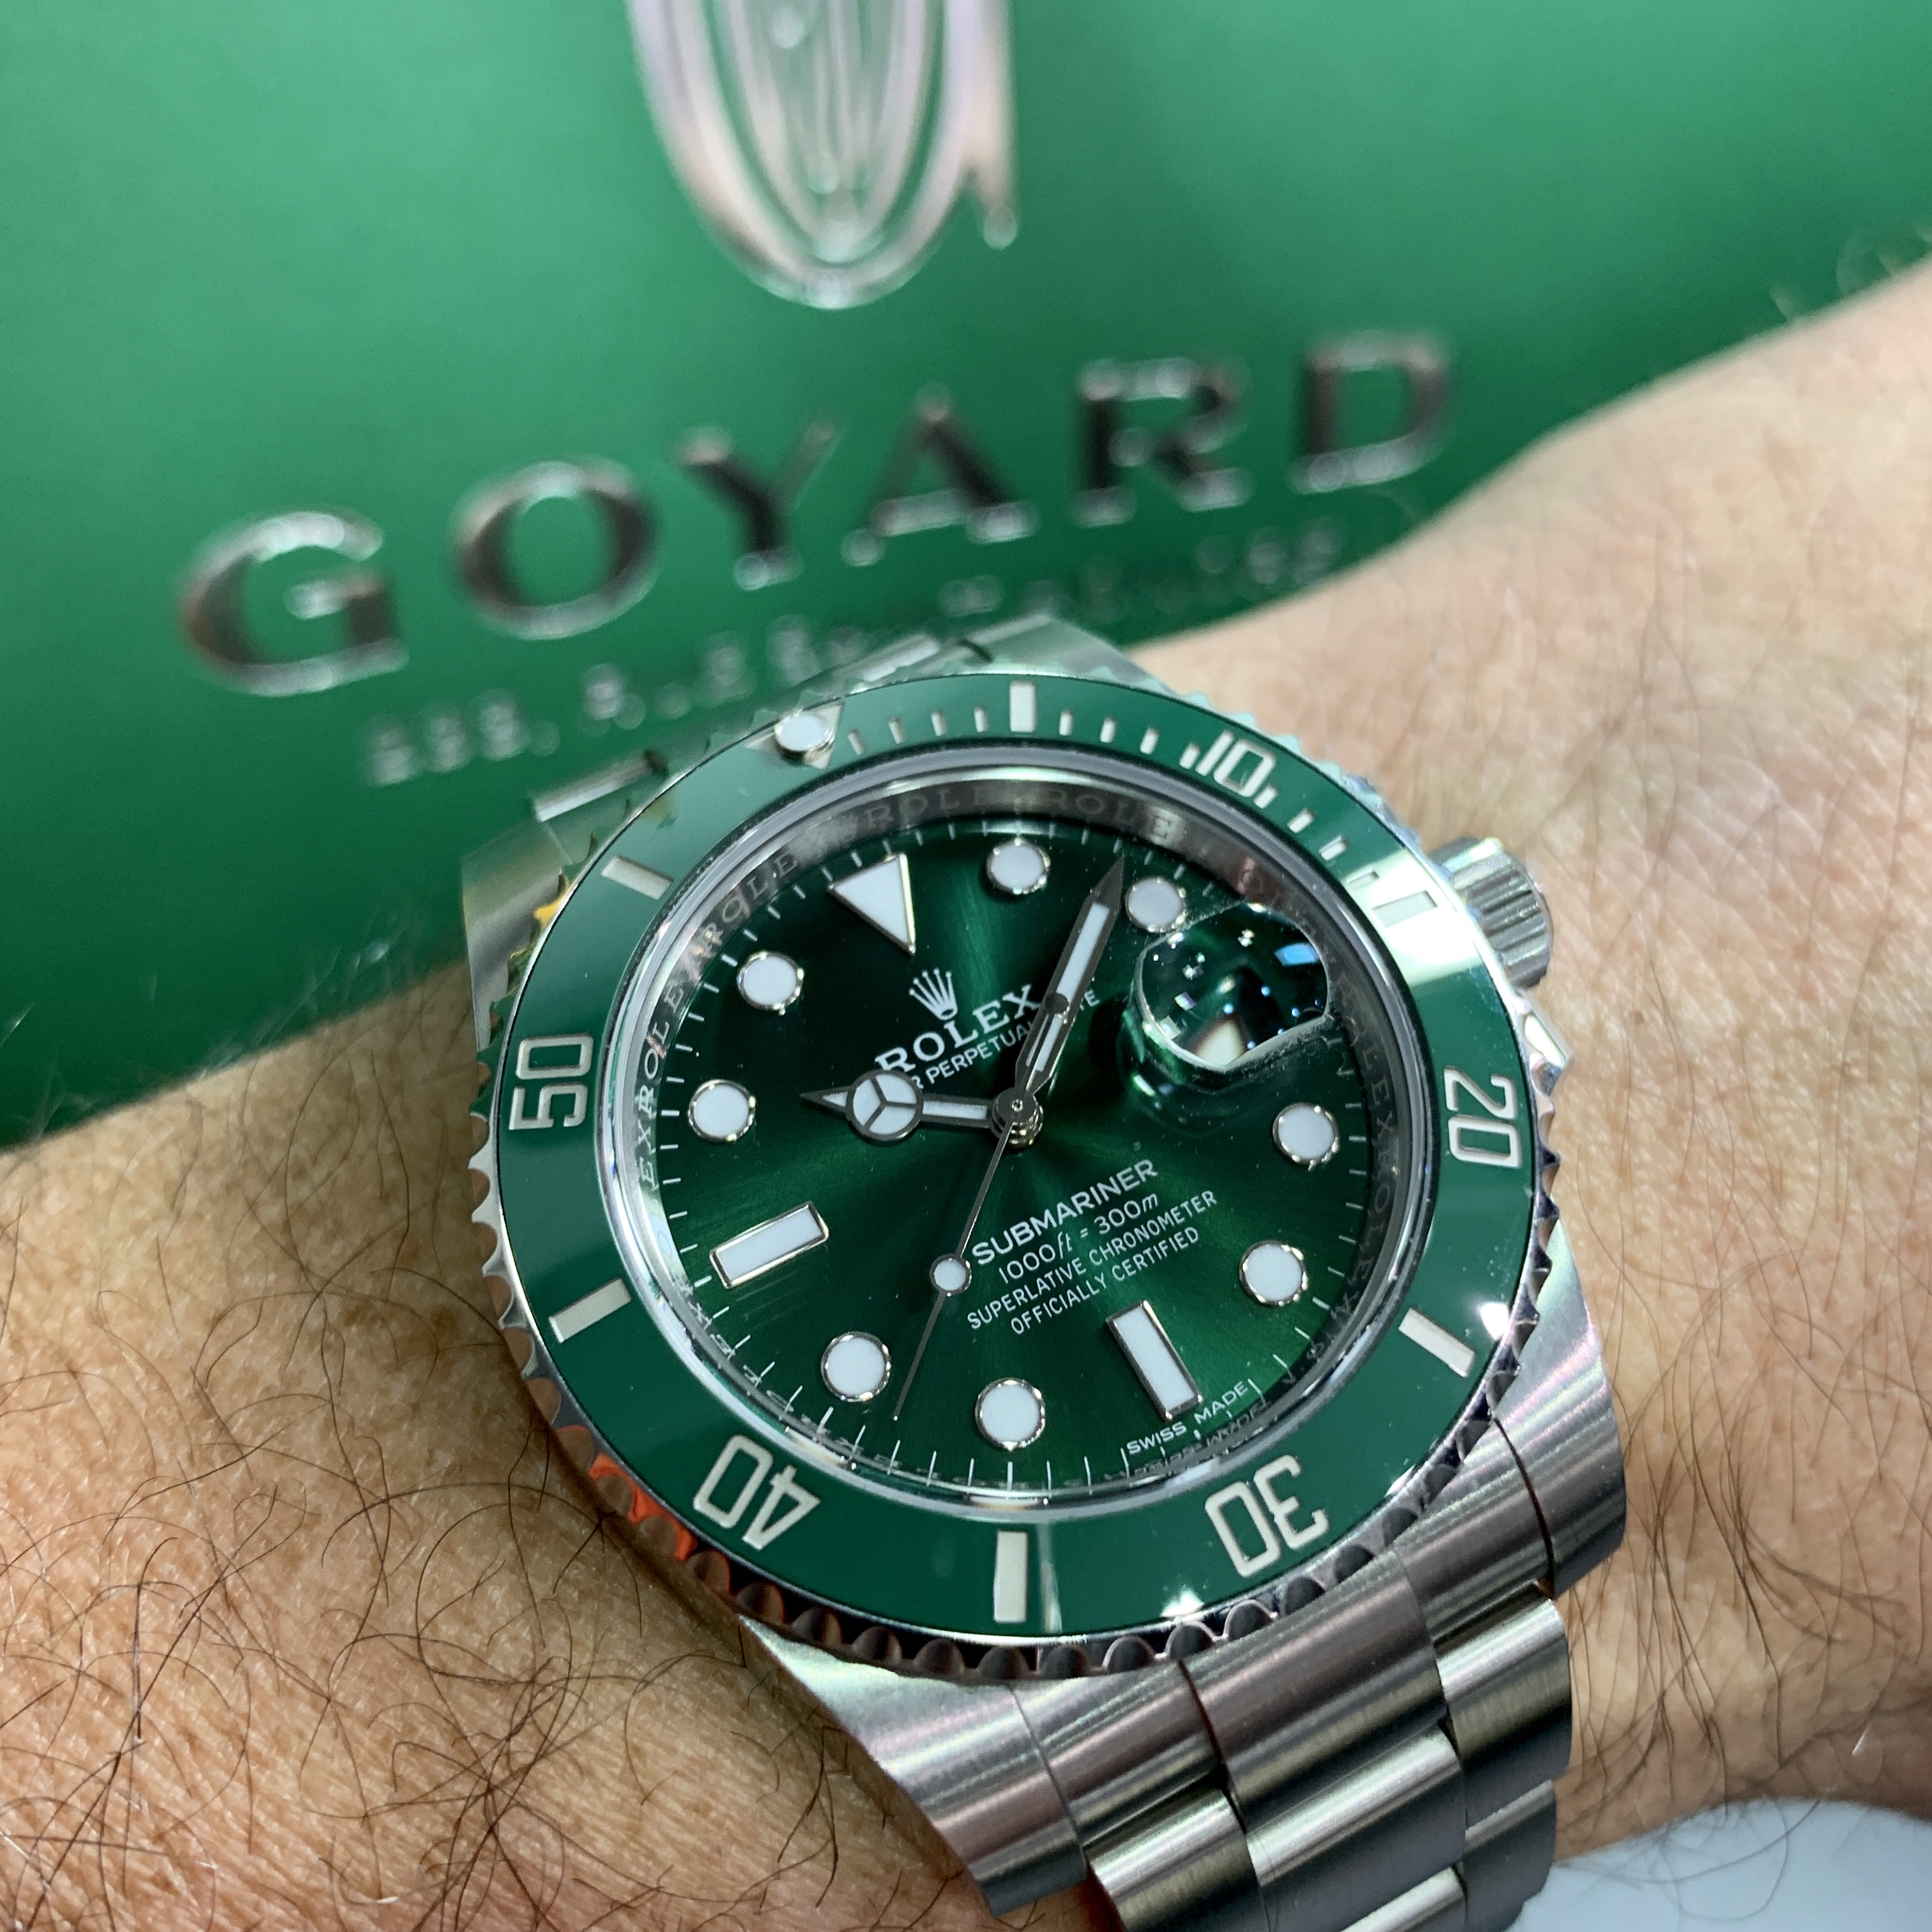 Rolex 24 Daytona >> Rolex Submariner green dial and bezel 116610LV - Carr Watches